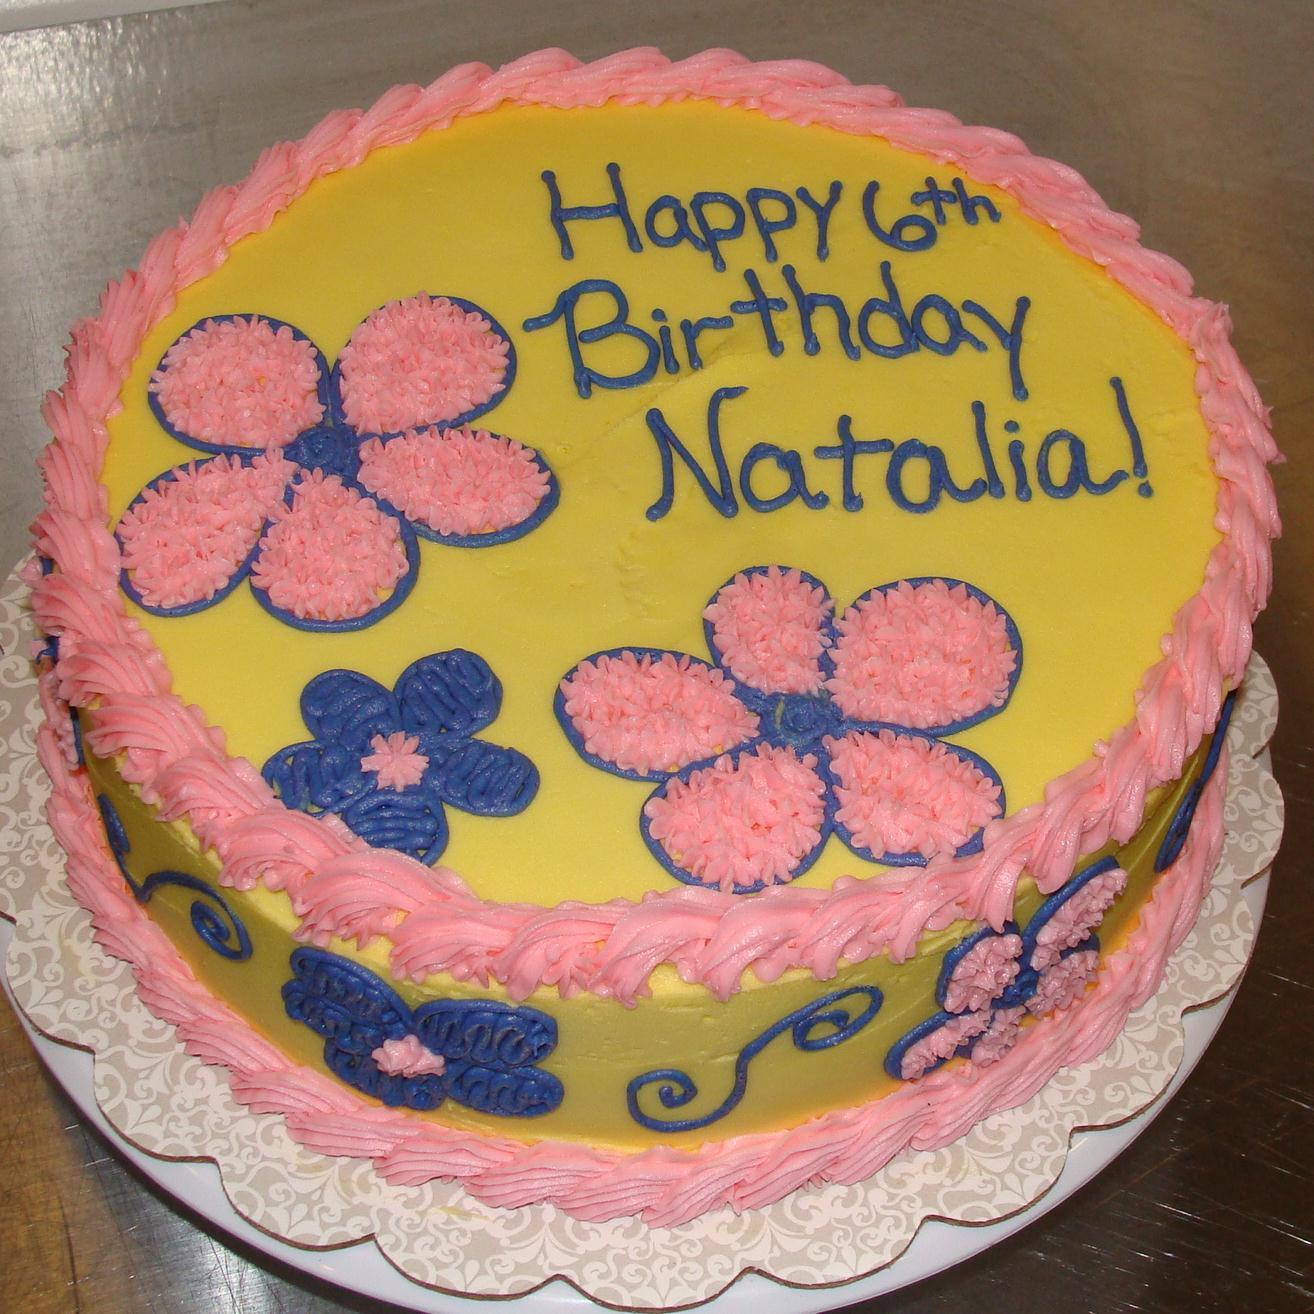 Door County Custom Cakes And Cookies Natalia S Birthday Cake